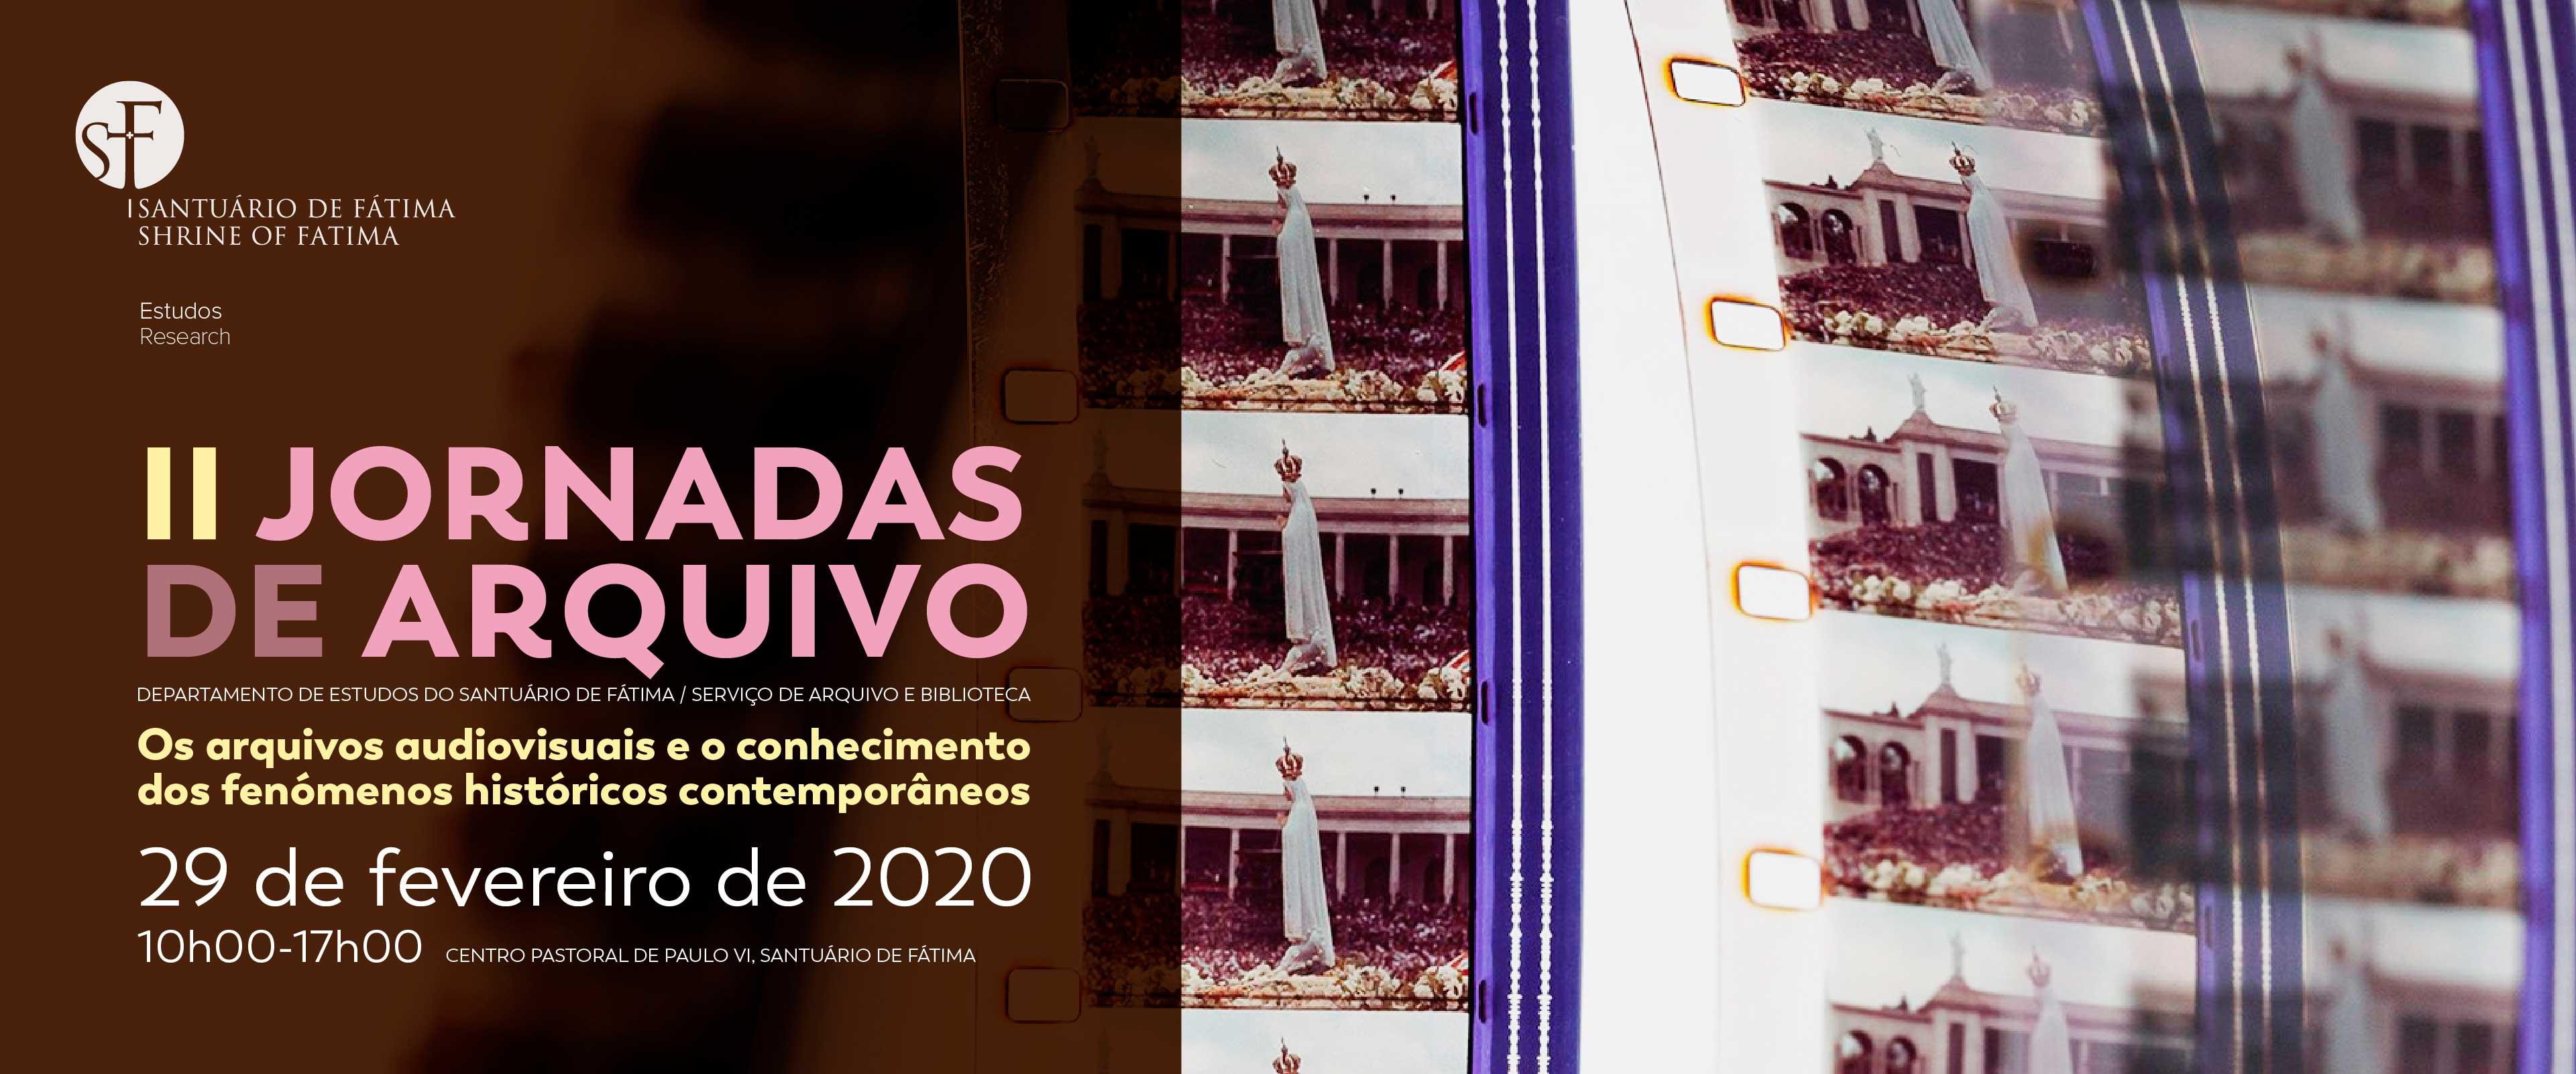 AF_-BANNER-_JORNADAS-DE-ARQUIVO-2020.jpg